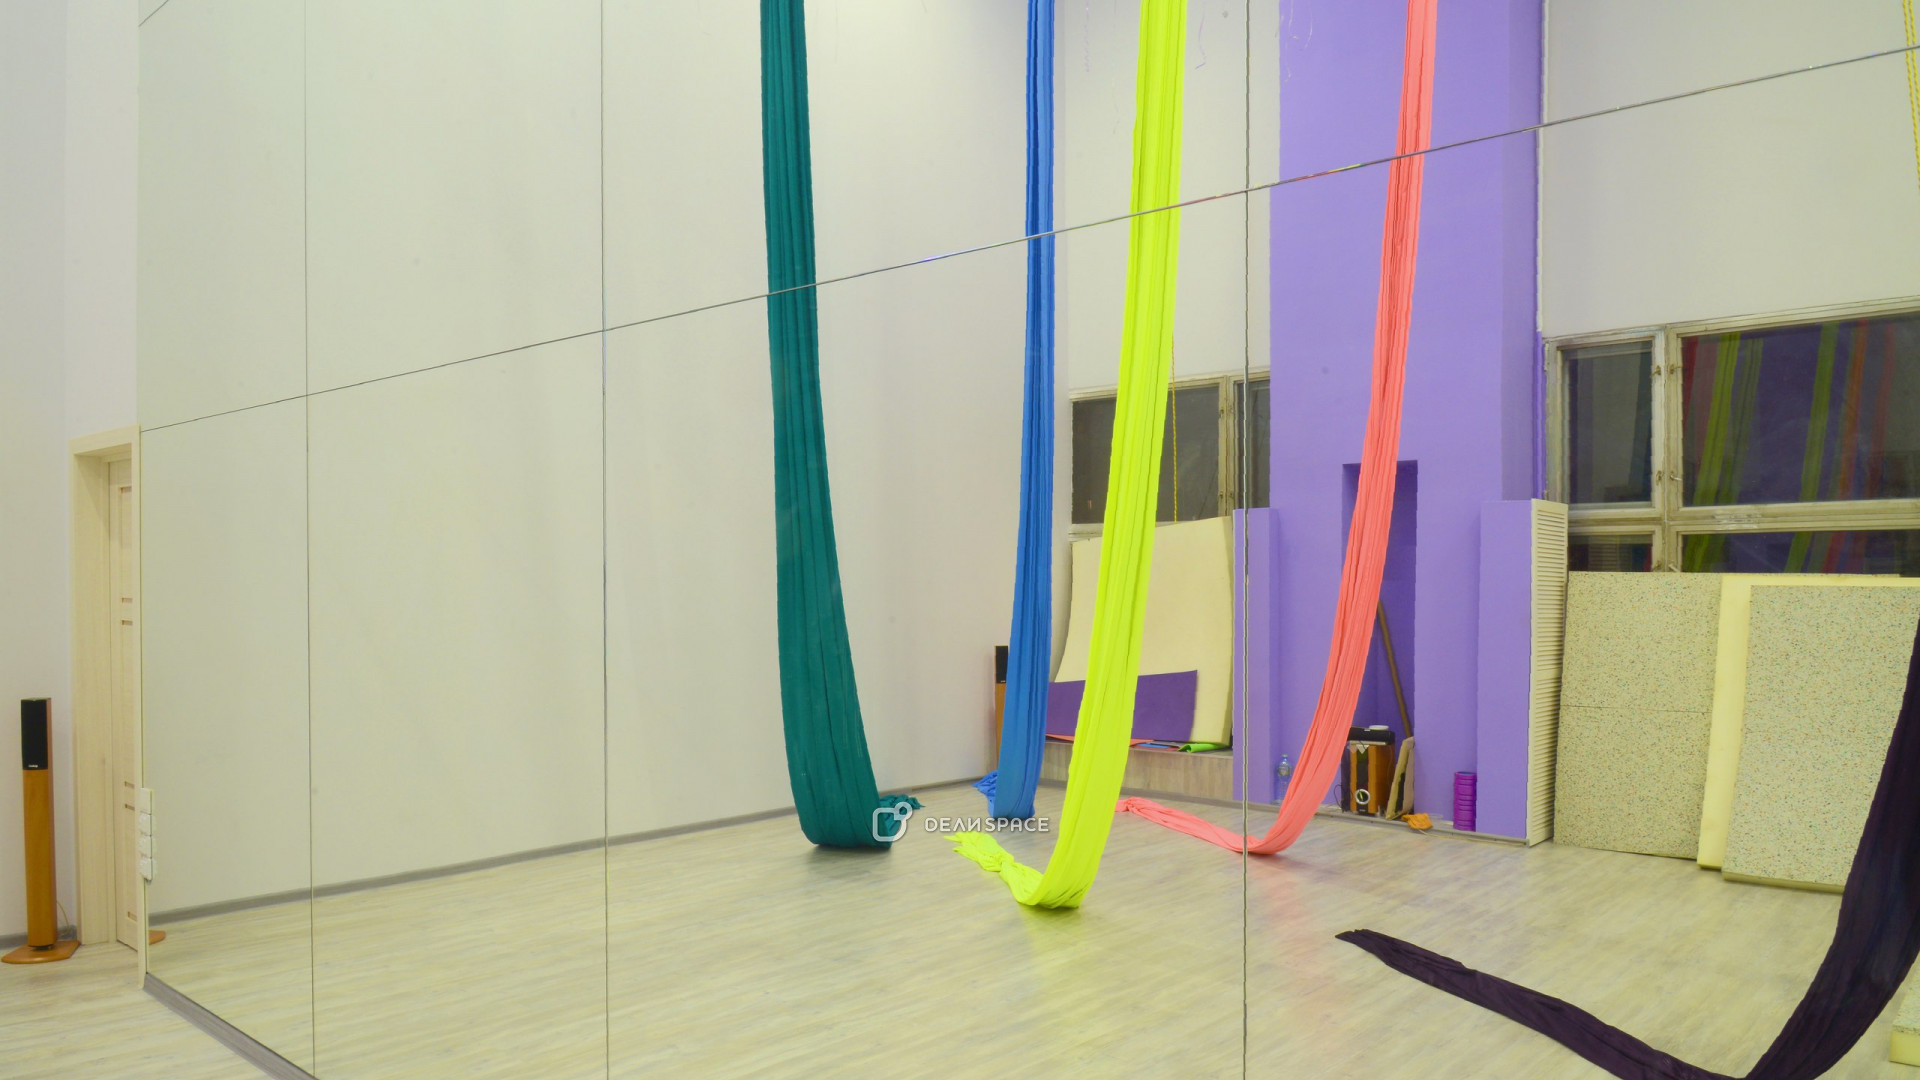 Зал воздушной гимнастики - фото №2